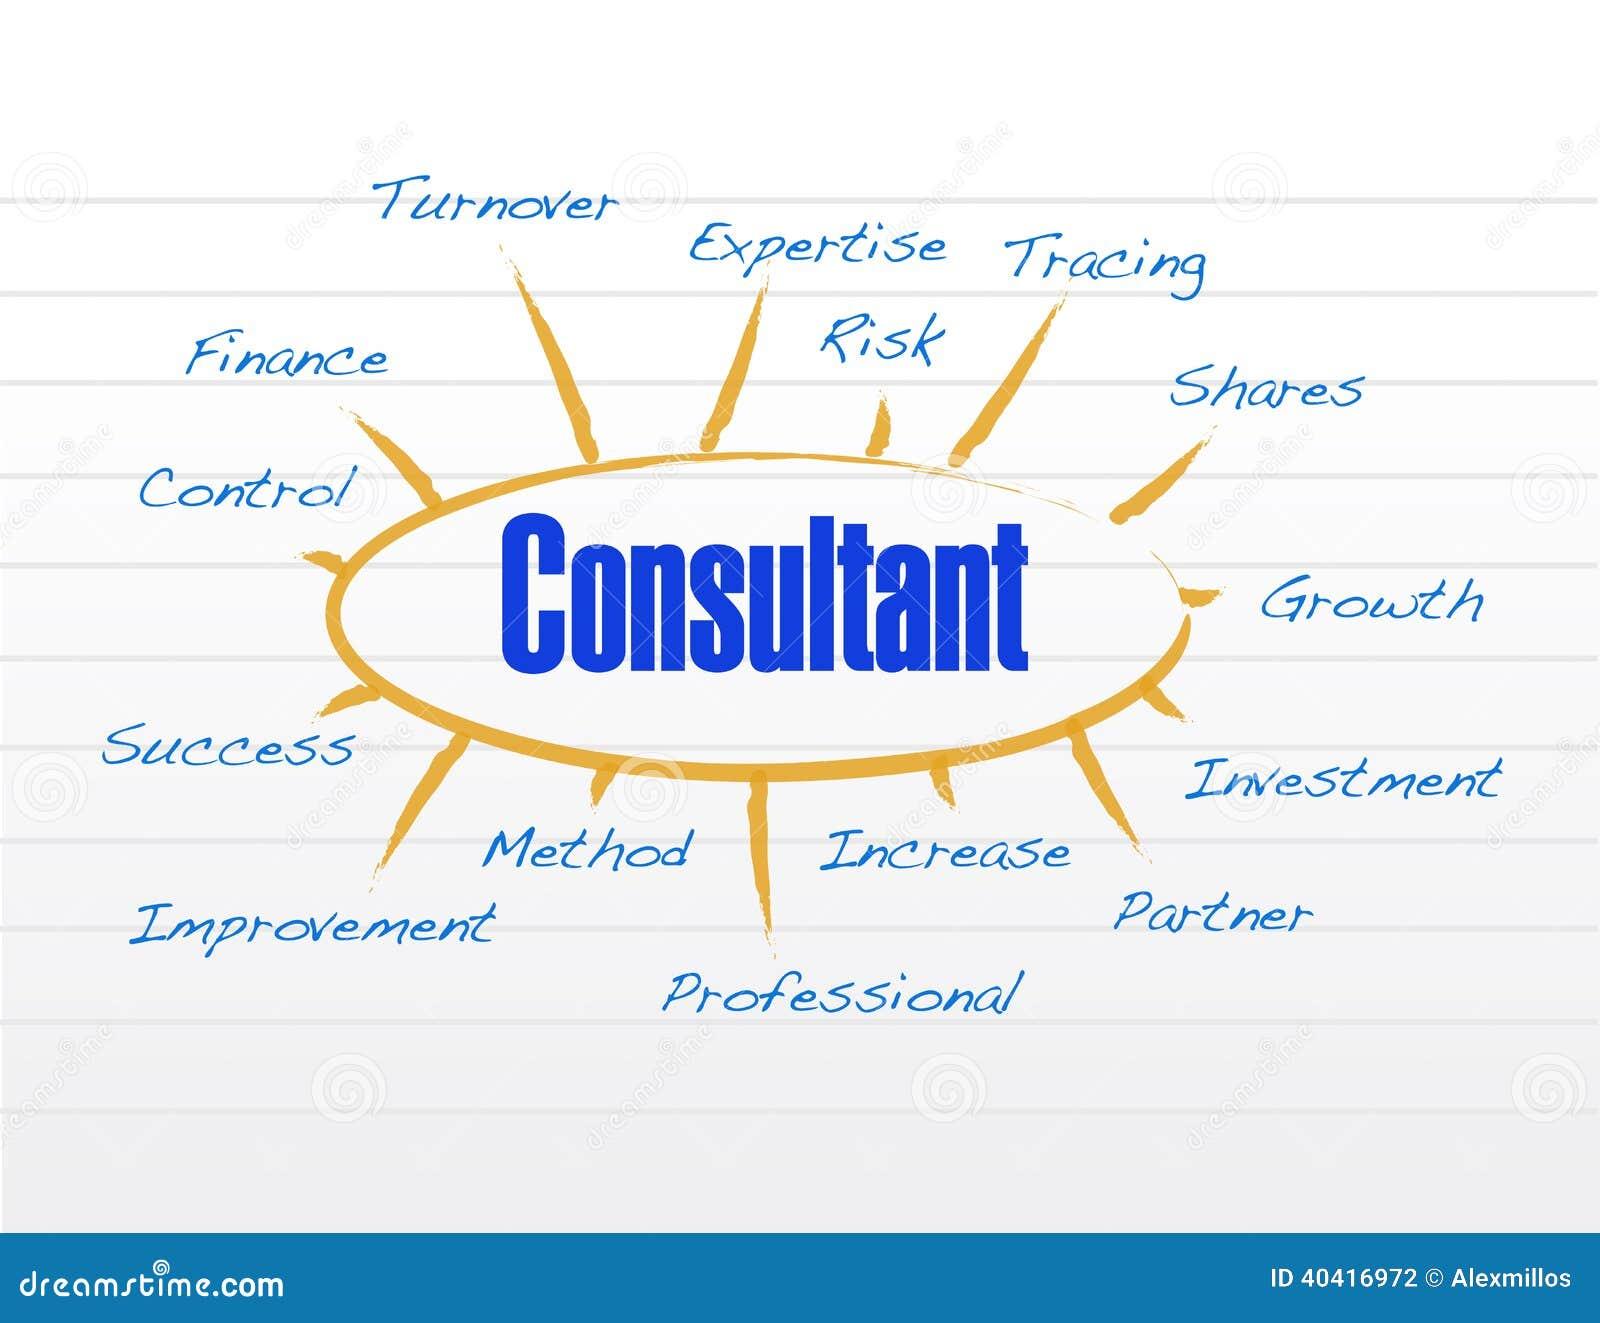 Consultant business model illustration design stock for Business design consultant